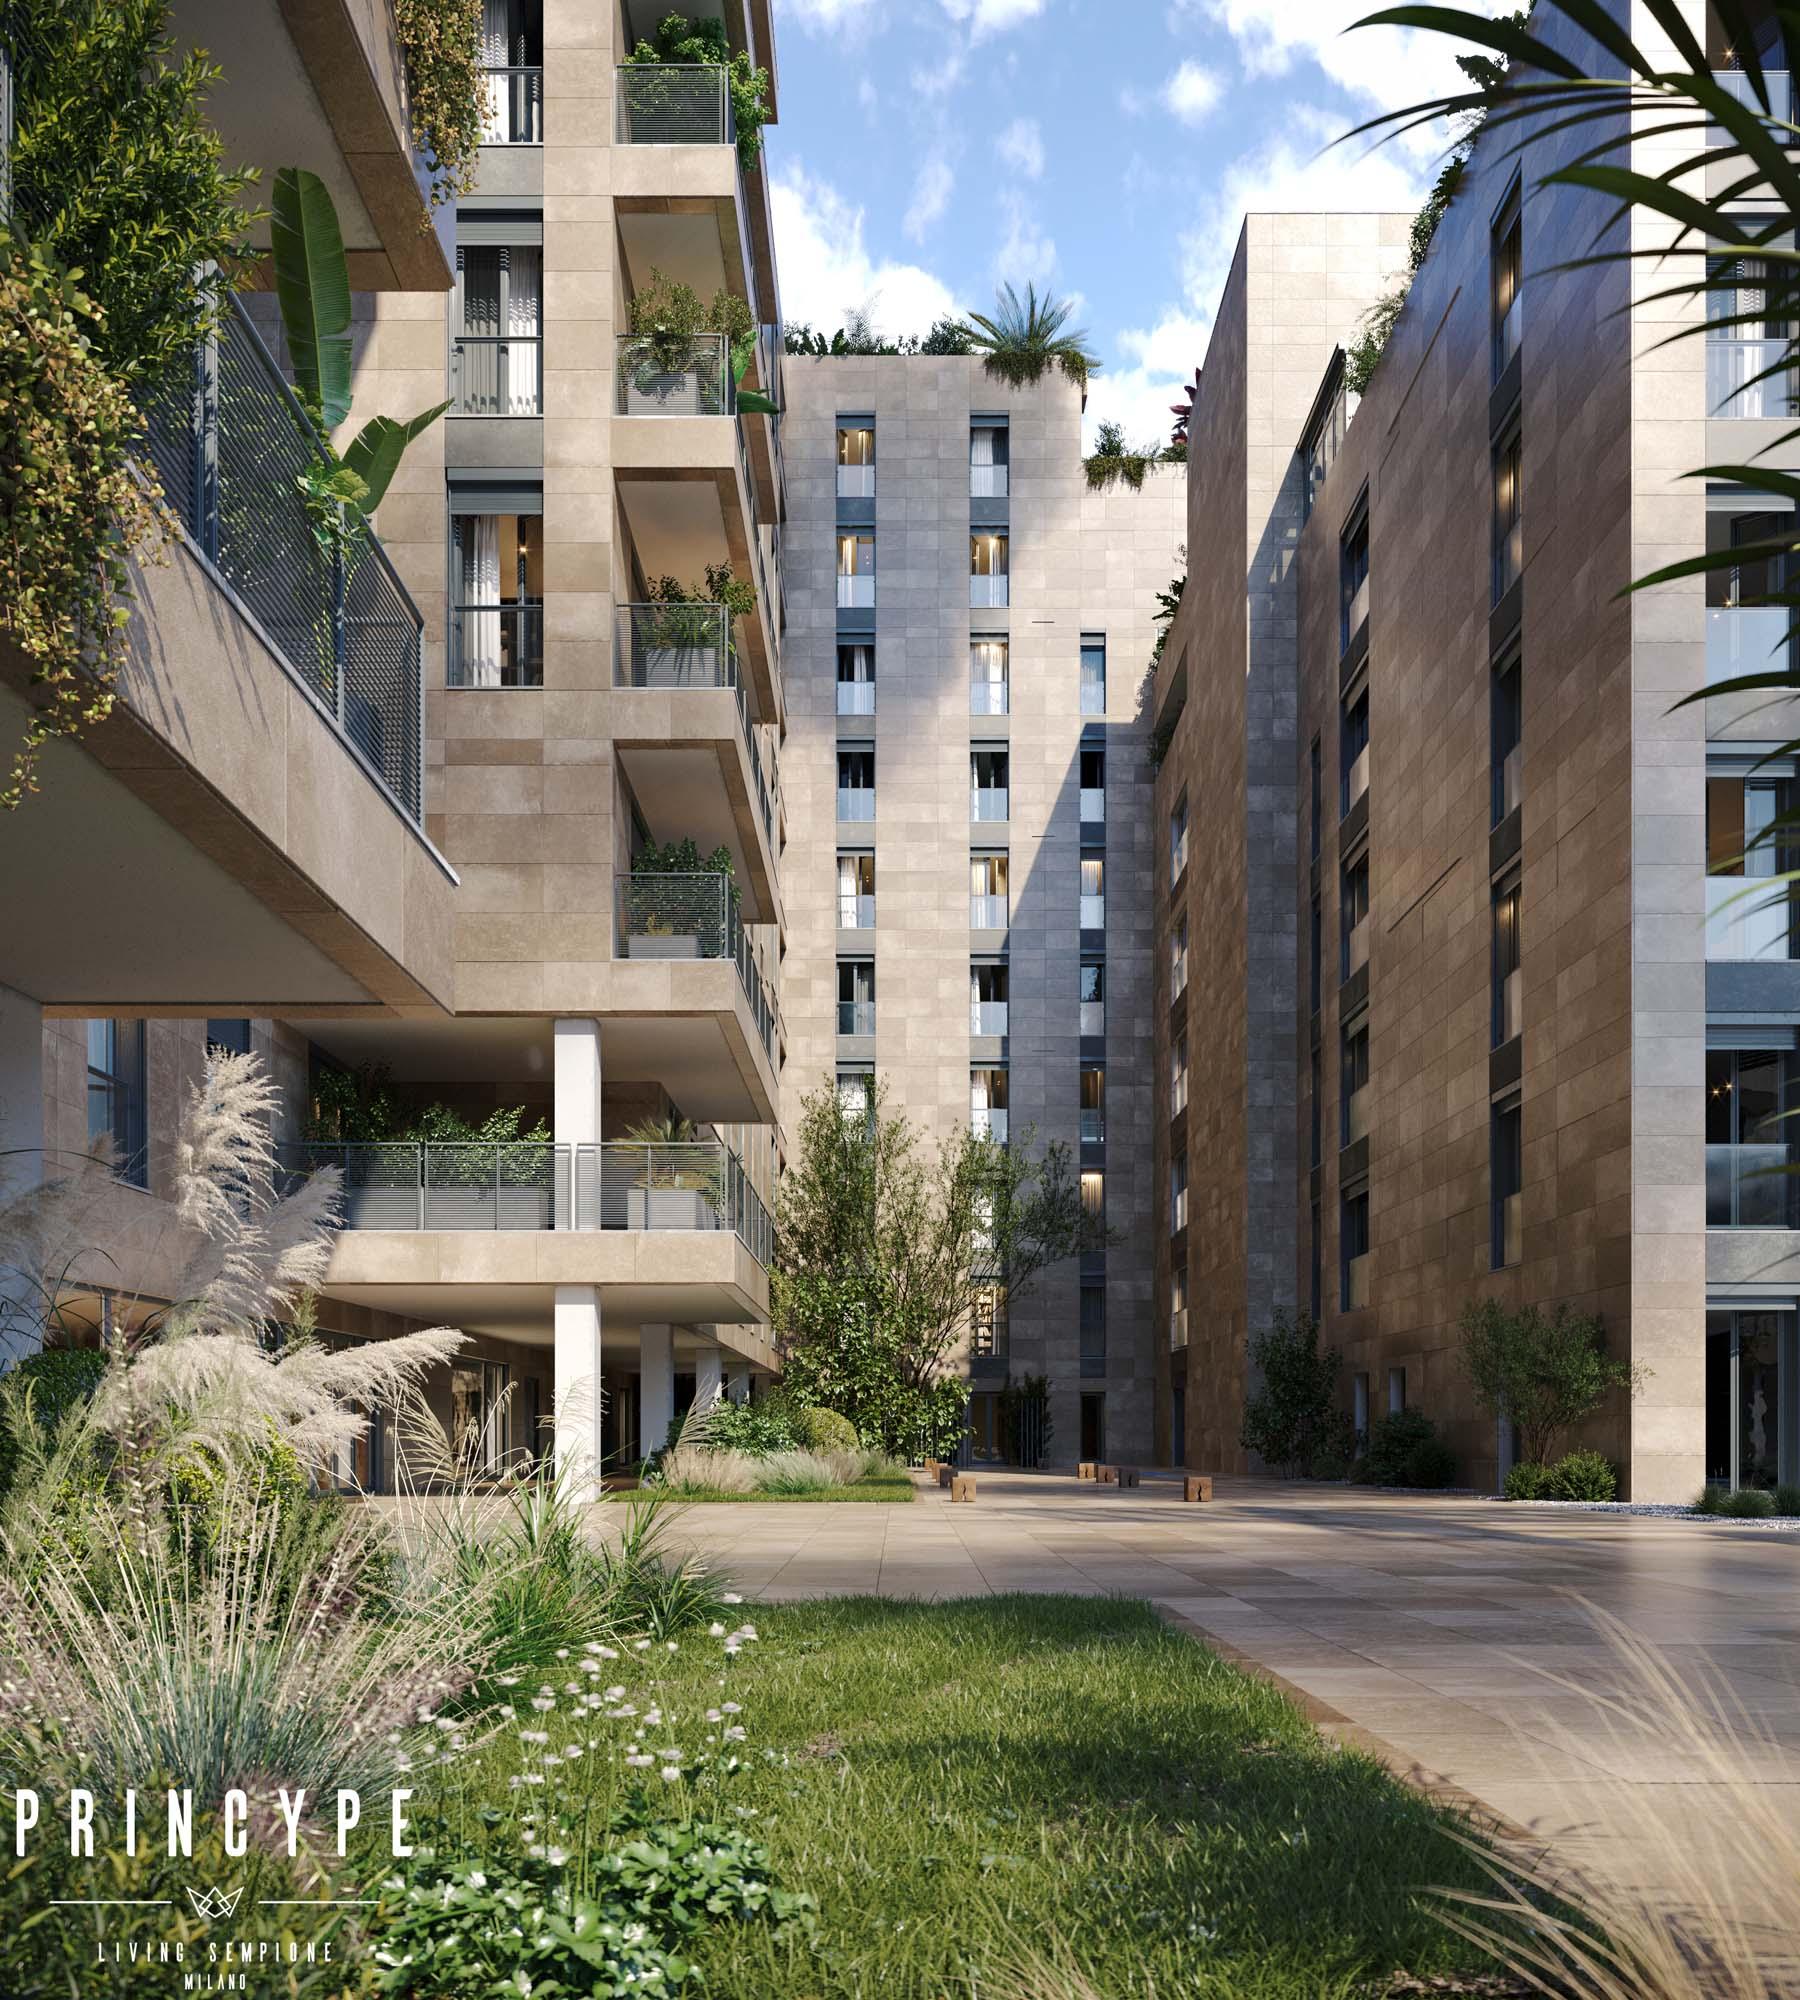 Princype_Milano, progetto Studio Marco Piva Image copyright: Tecma Solutions